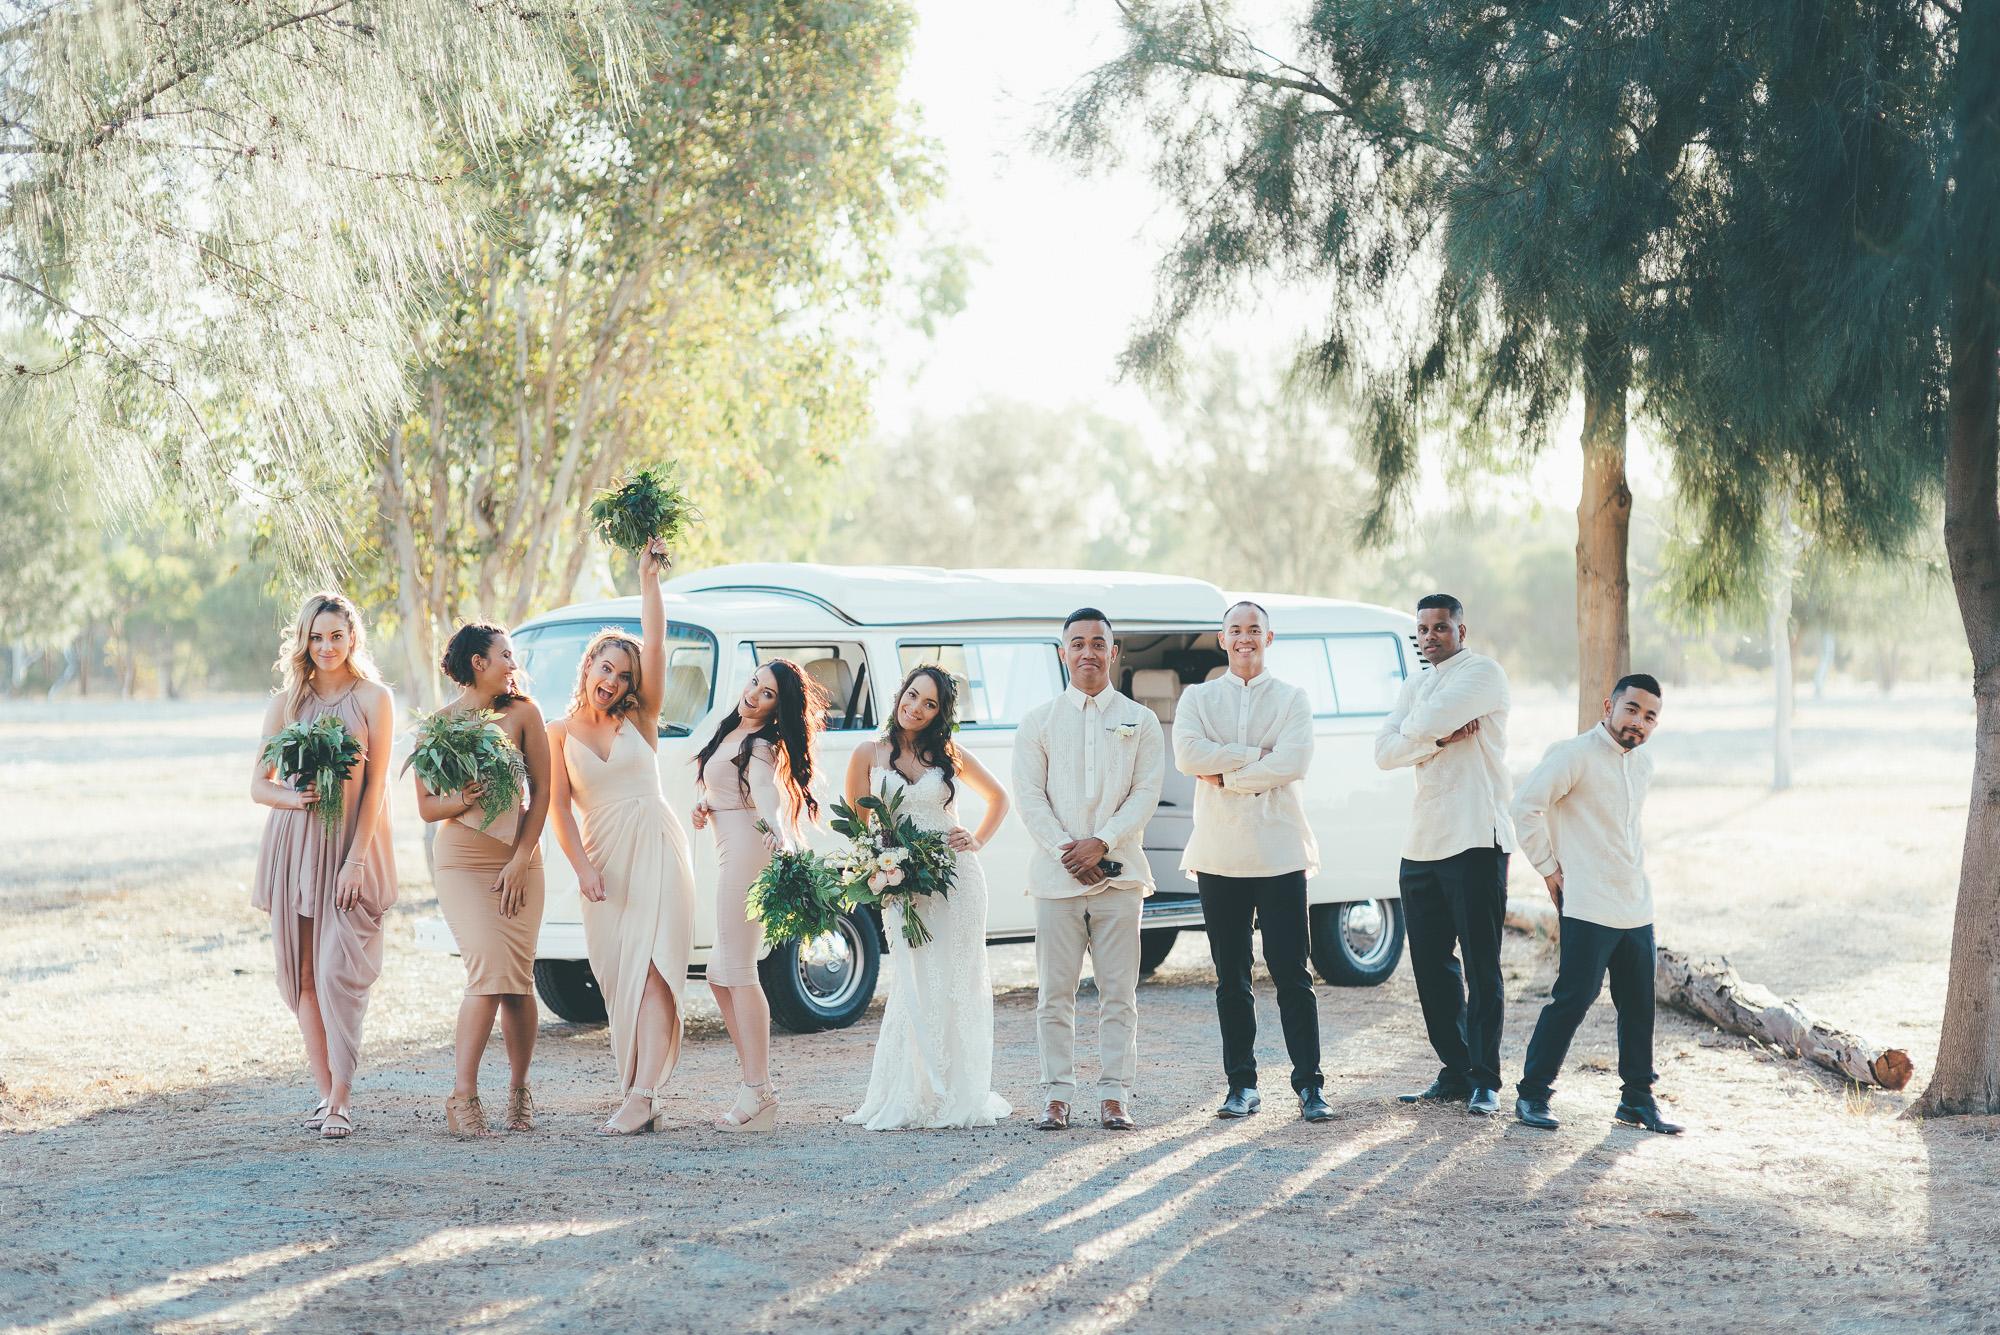 wedding-photographer-outdoor-casual-styled-los-angeles-australia-california-international-earthbound -56.jpg